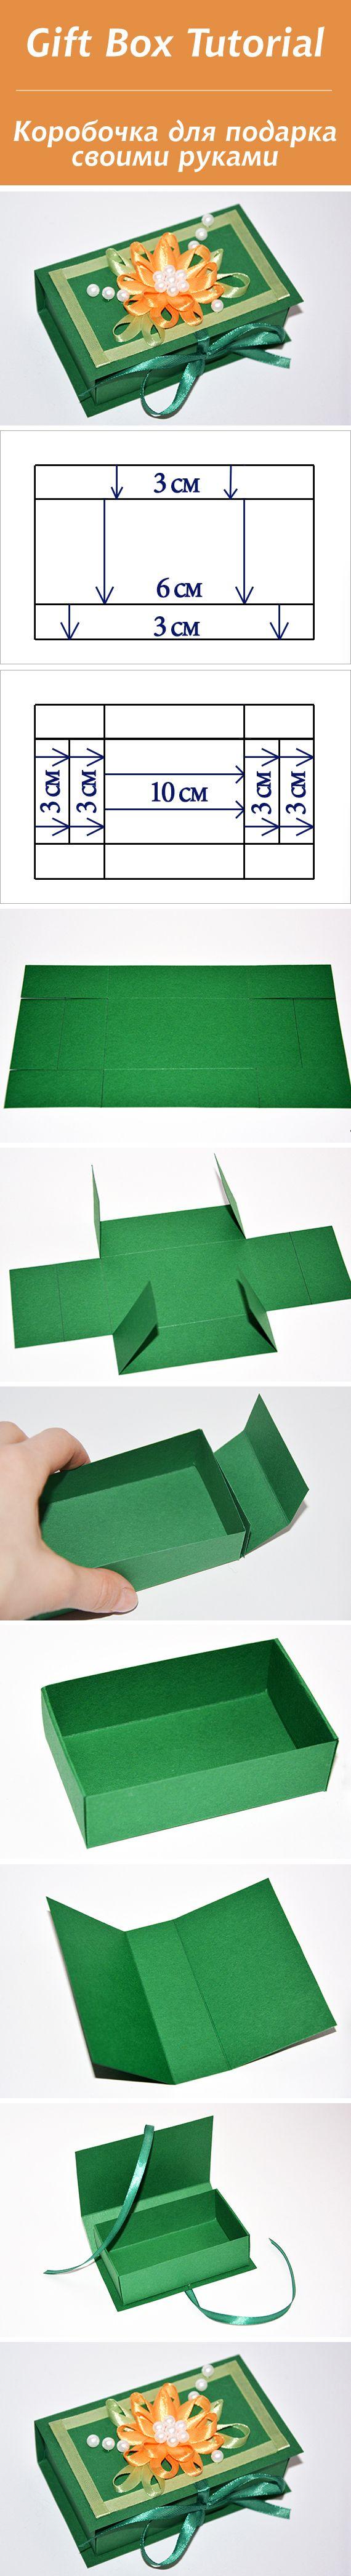 Gift Box Tutorial / Коробочка-шкатулка для подарка #tutorial #diy #giftbox